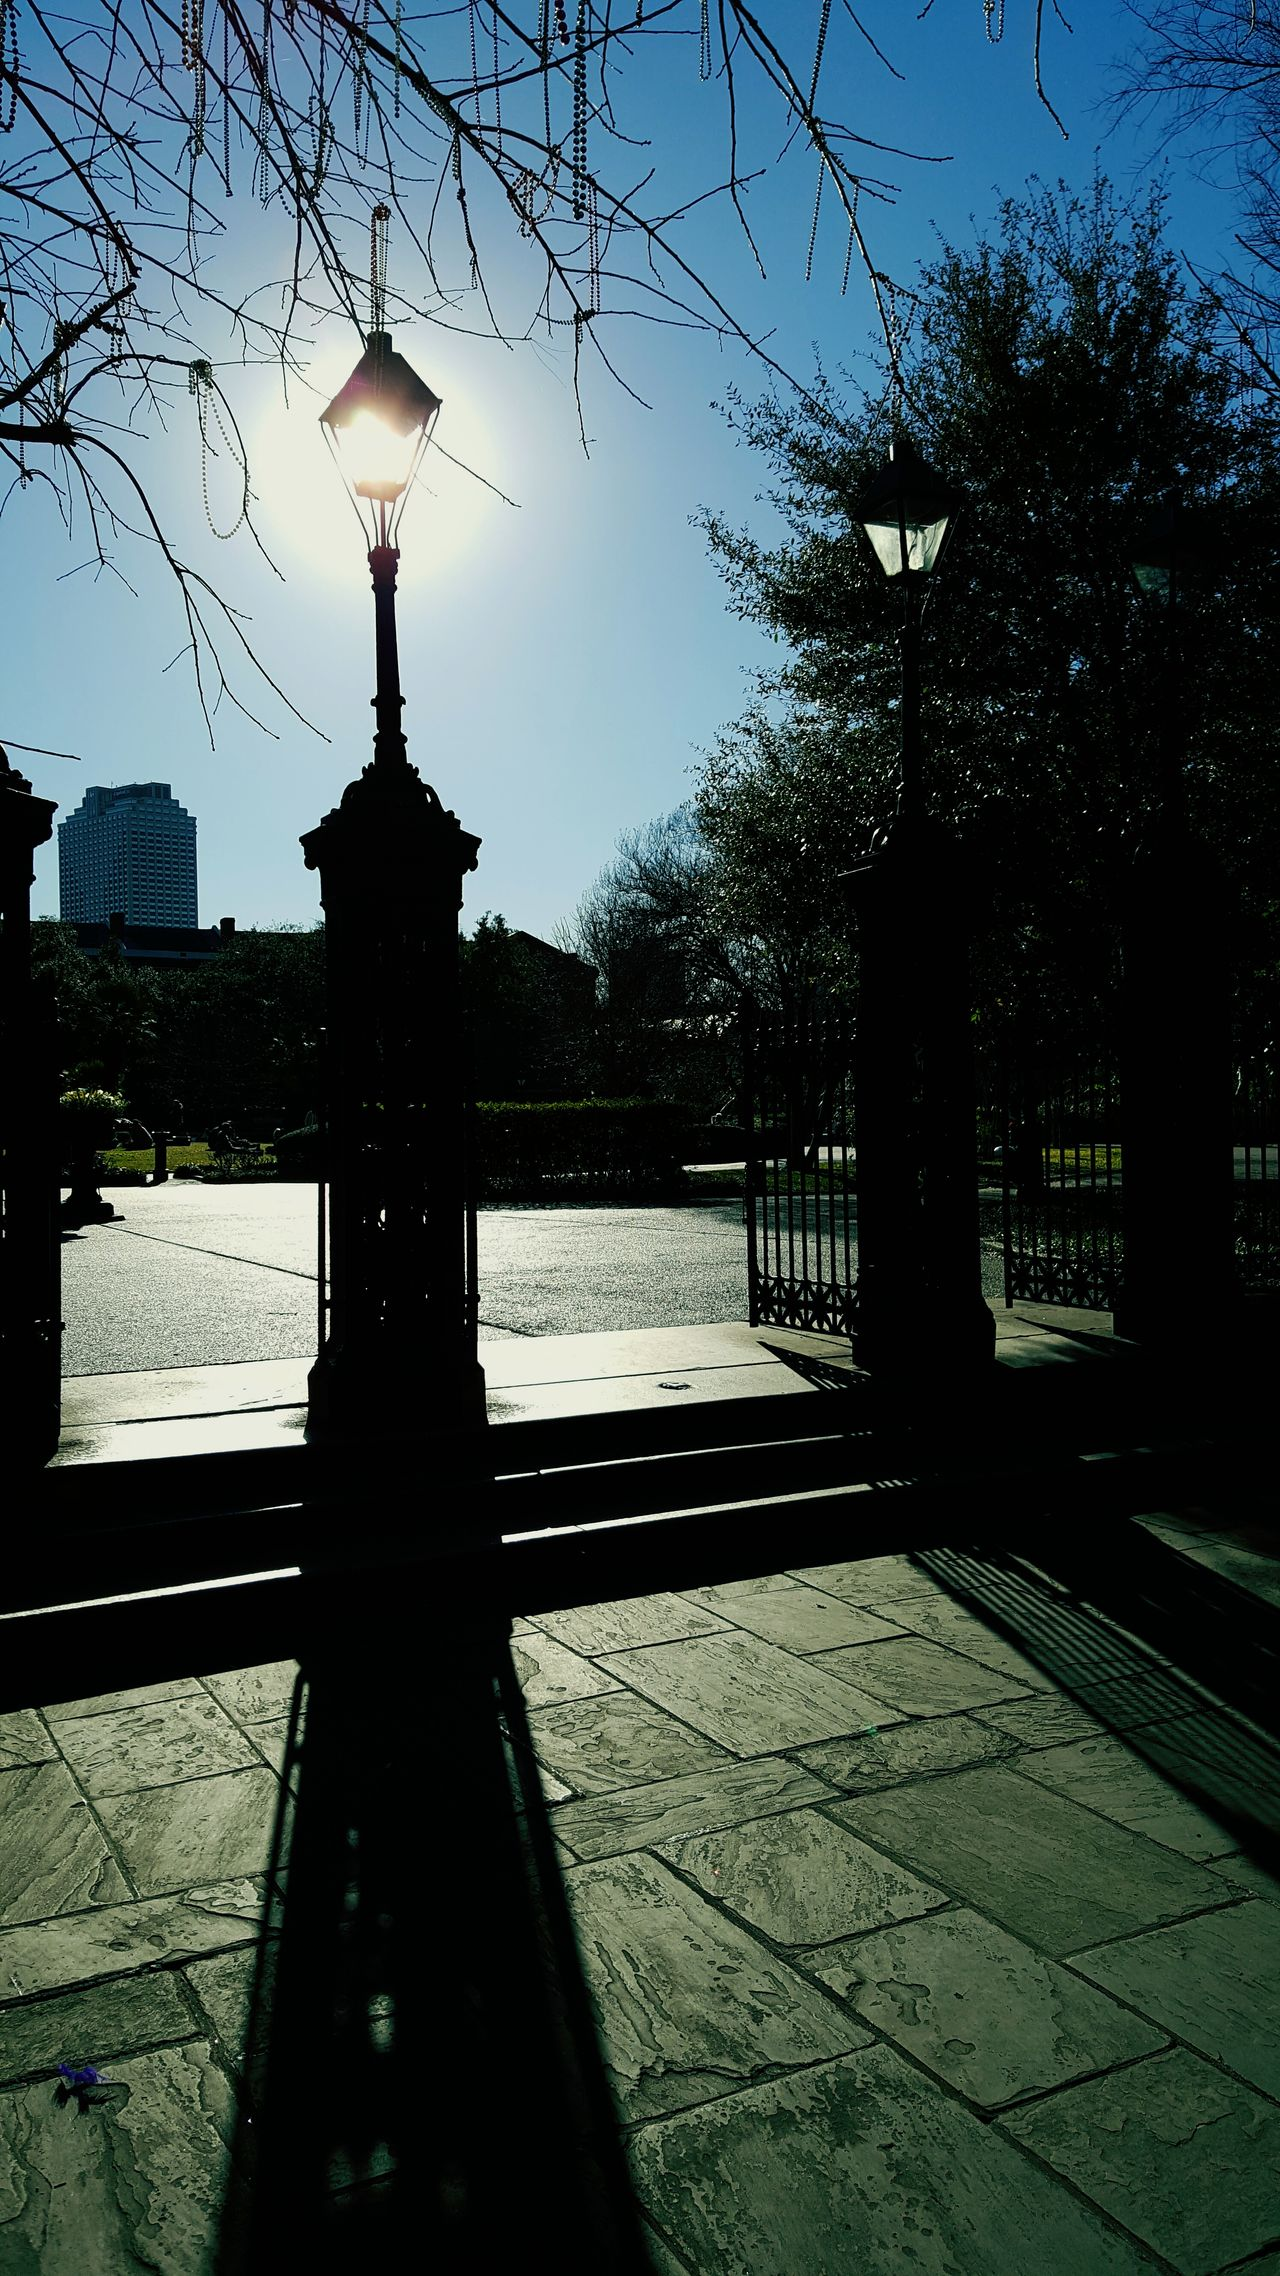 Lightpost Neworleans JacksonSqaure Jackson Square Gate Captured Light Light Wrought Iron Fence Fencepost Art Walk Sunshine